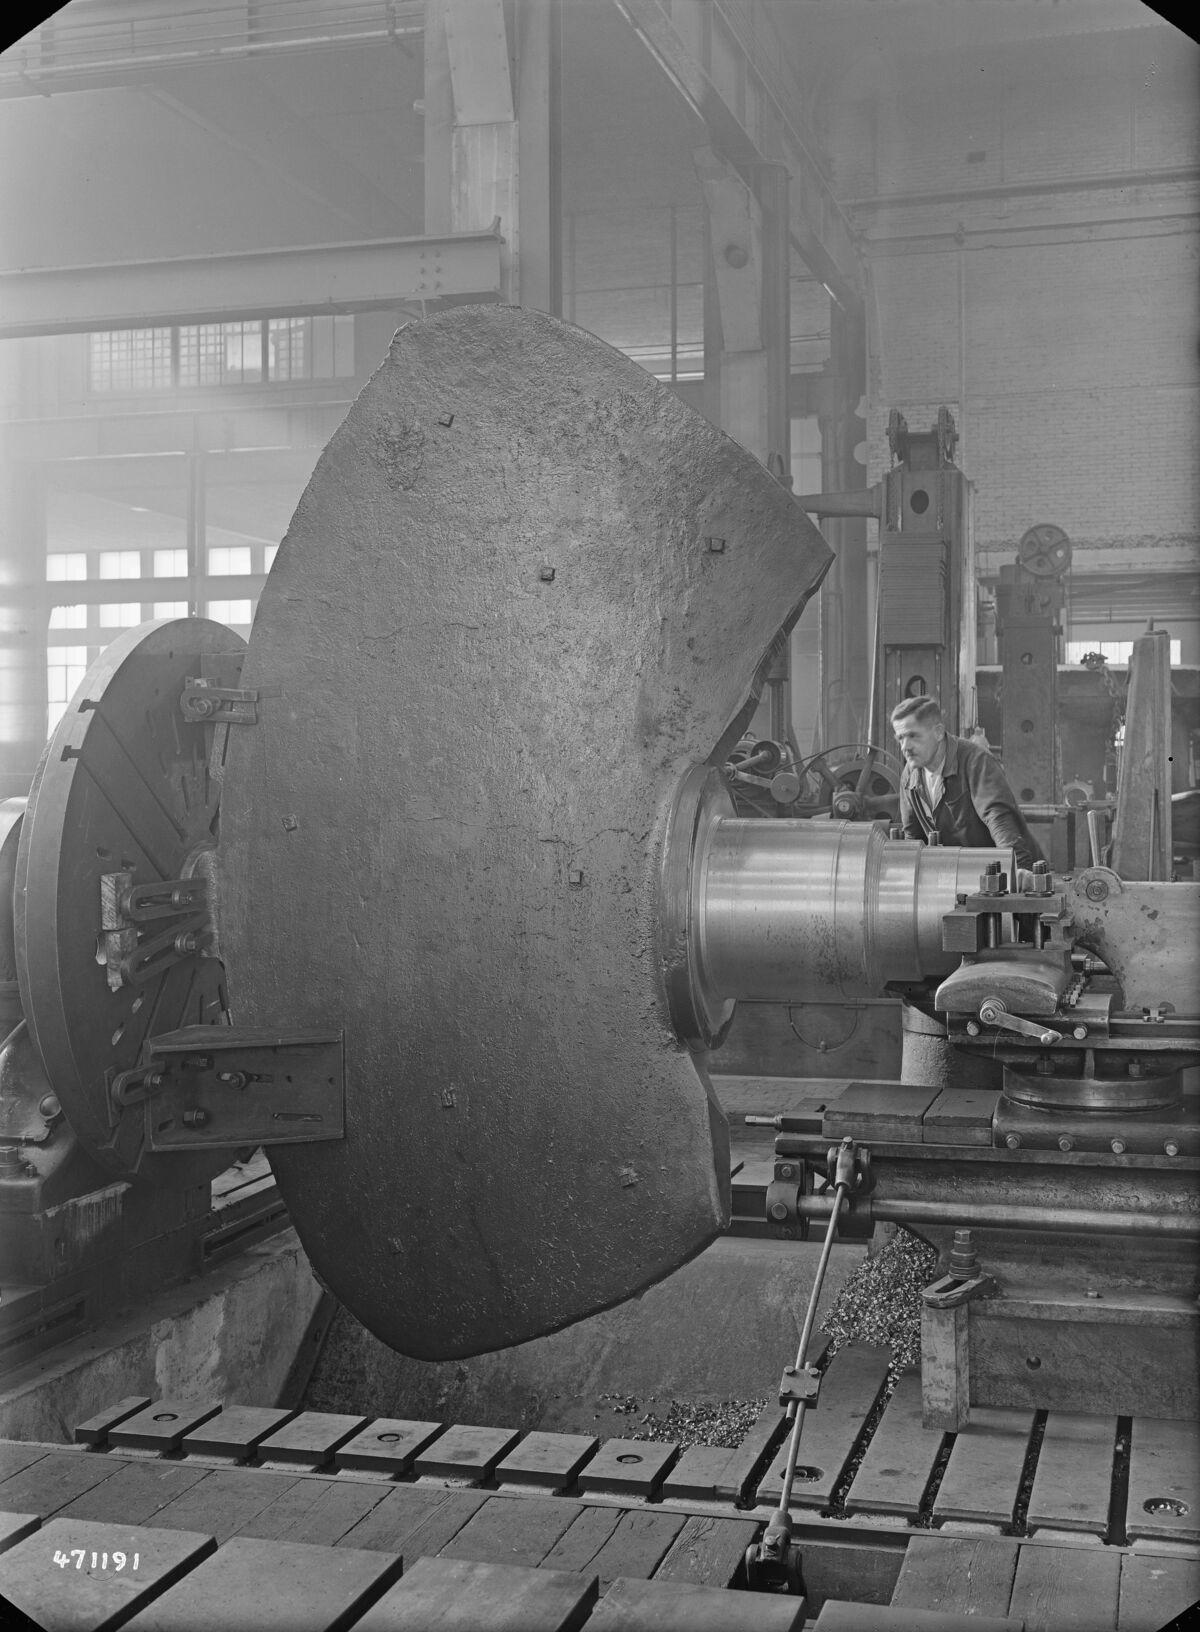 GFA 16/471191: Kaplan blade for Finland, Escher Wyss